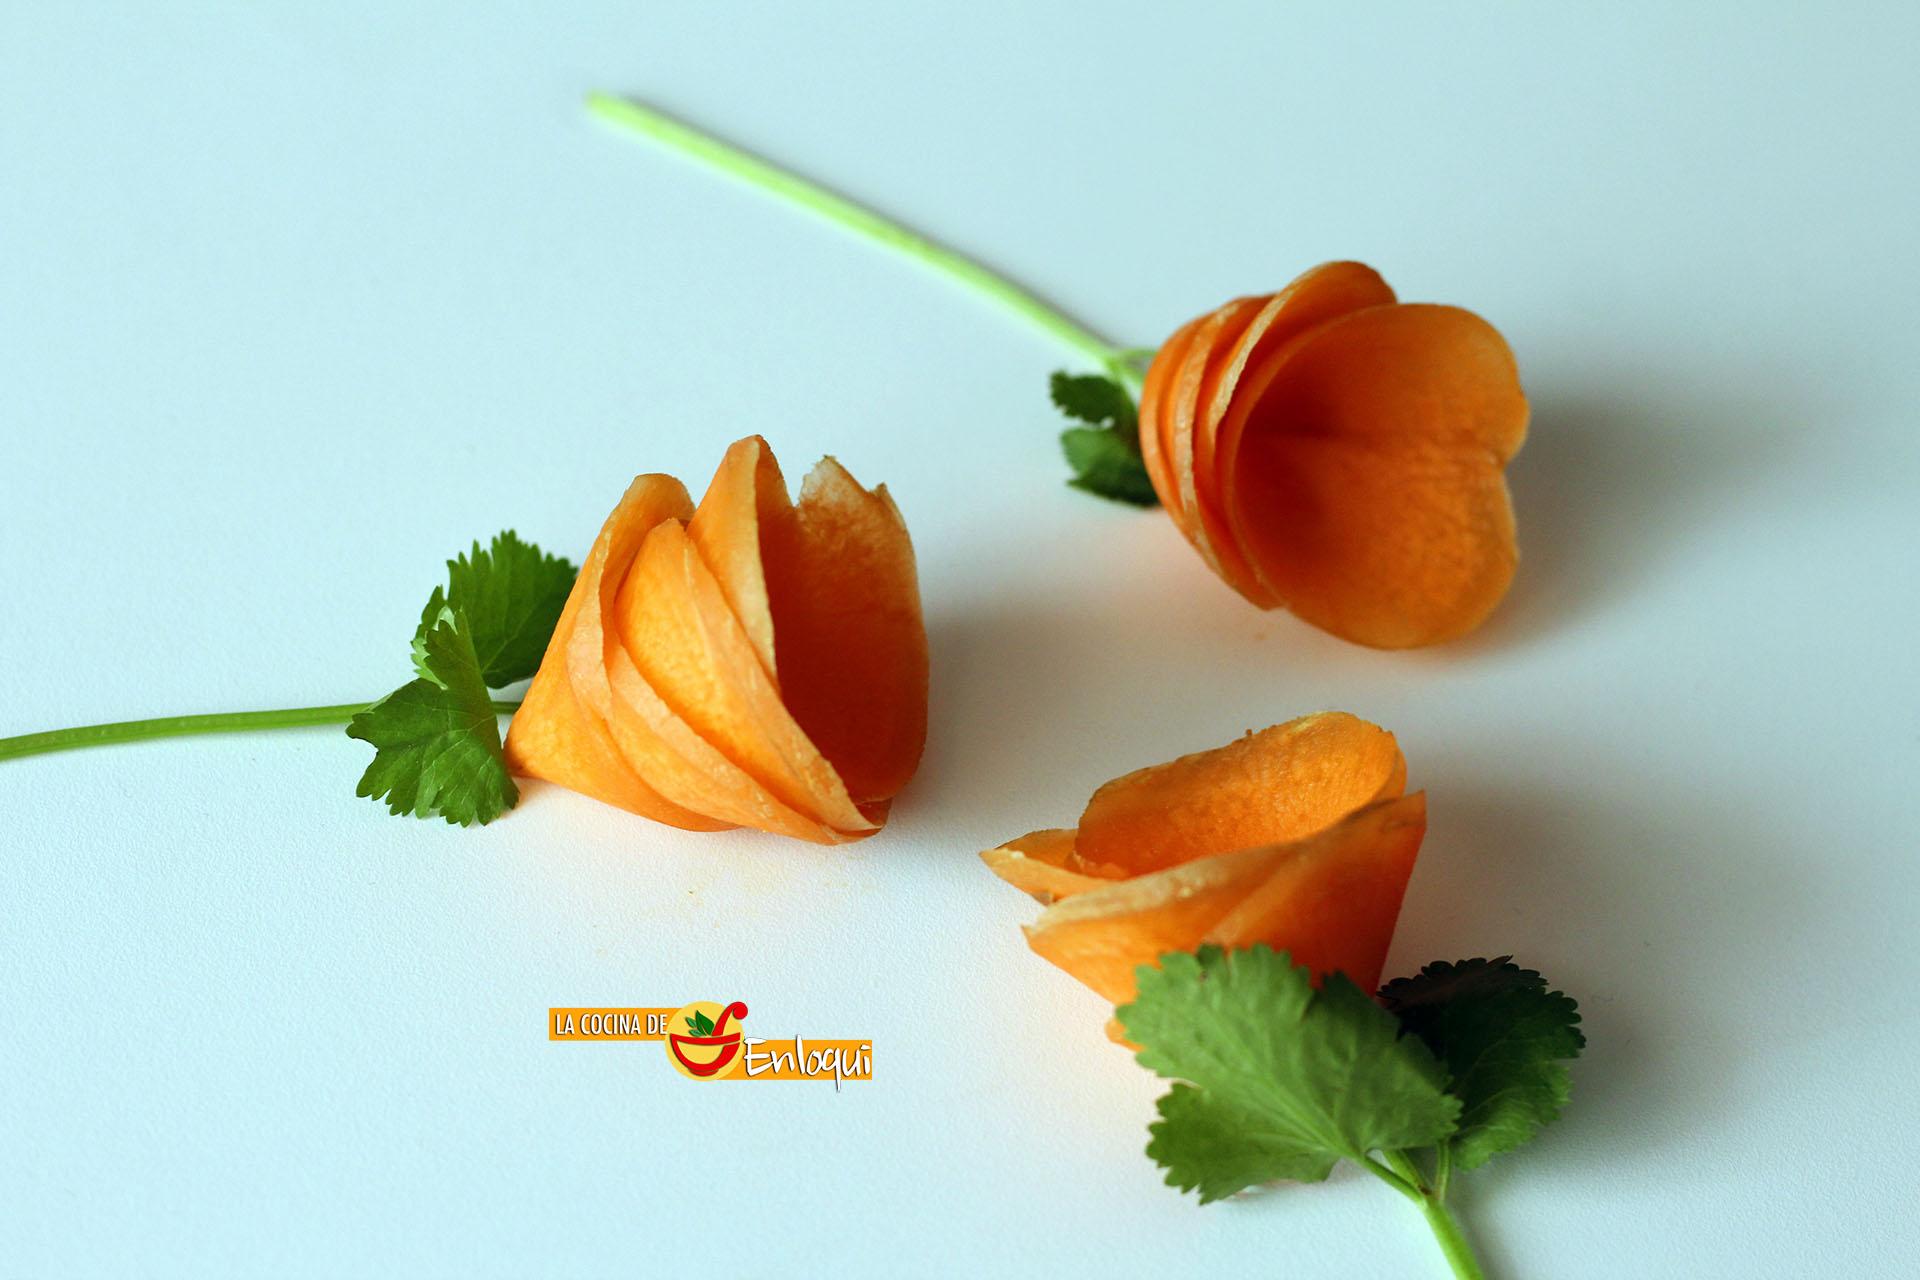 Flores De Zanahoria Tips De Cocina La Cocina De Enloqui Te gustará saber que son muchas las. flores de zanahoria tips de cocina